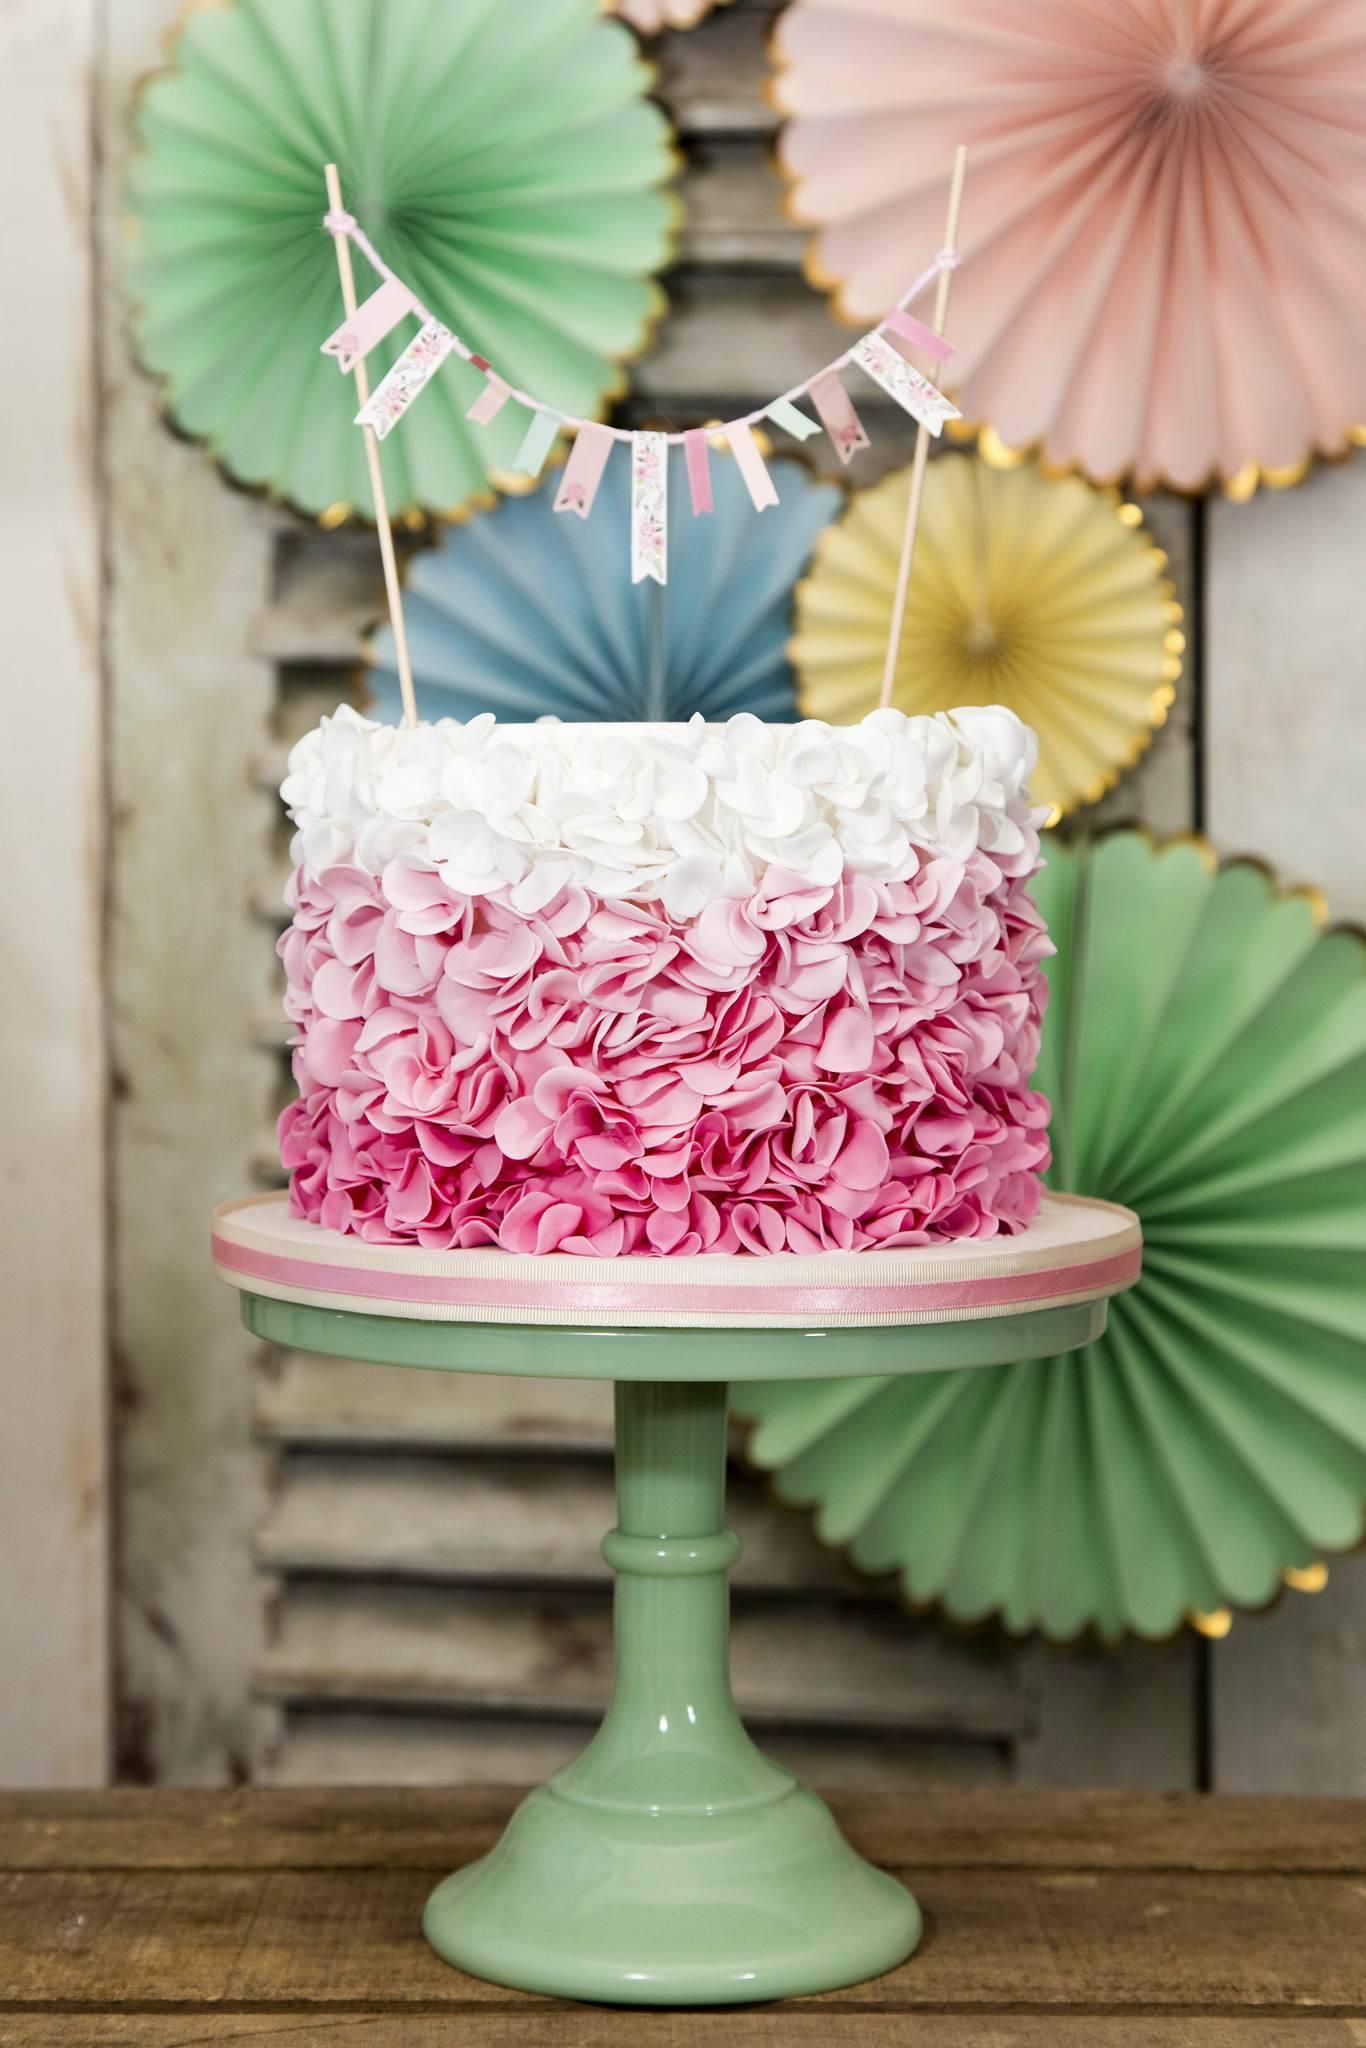 Ombre ruffle birthday cake